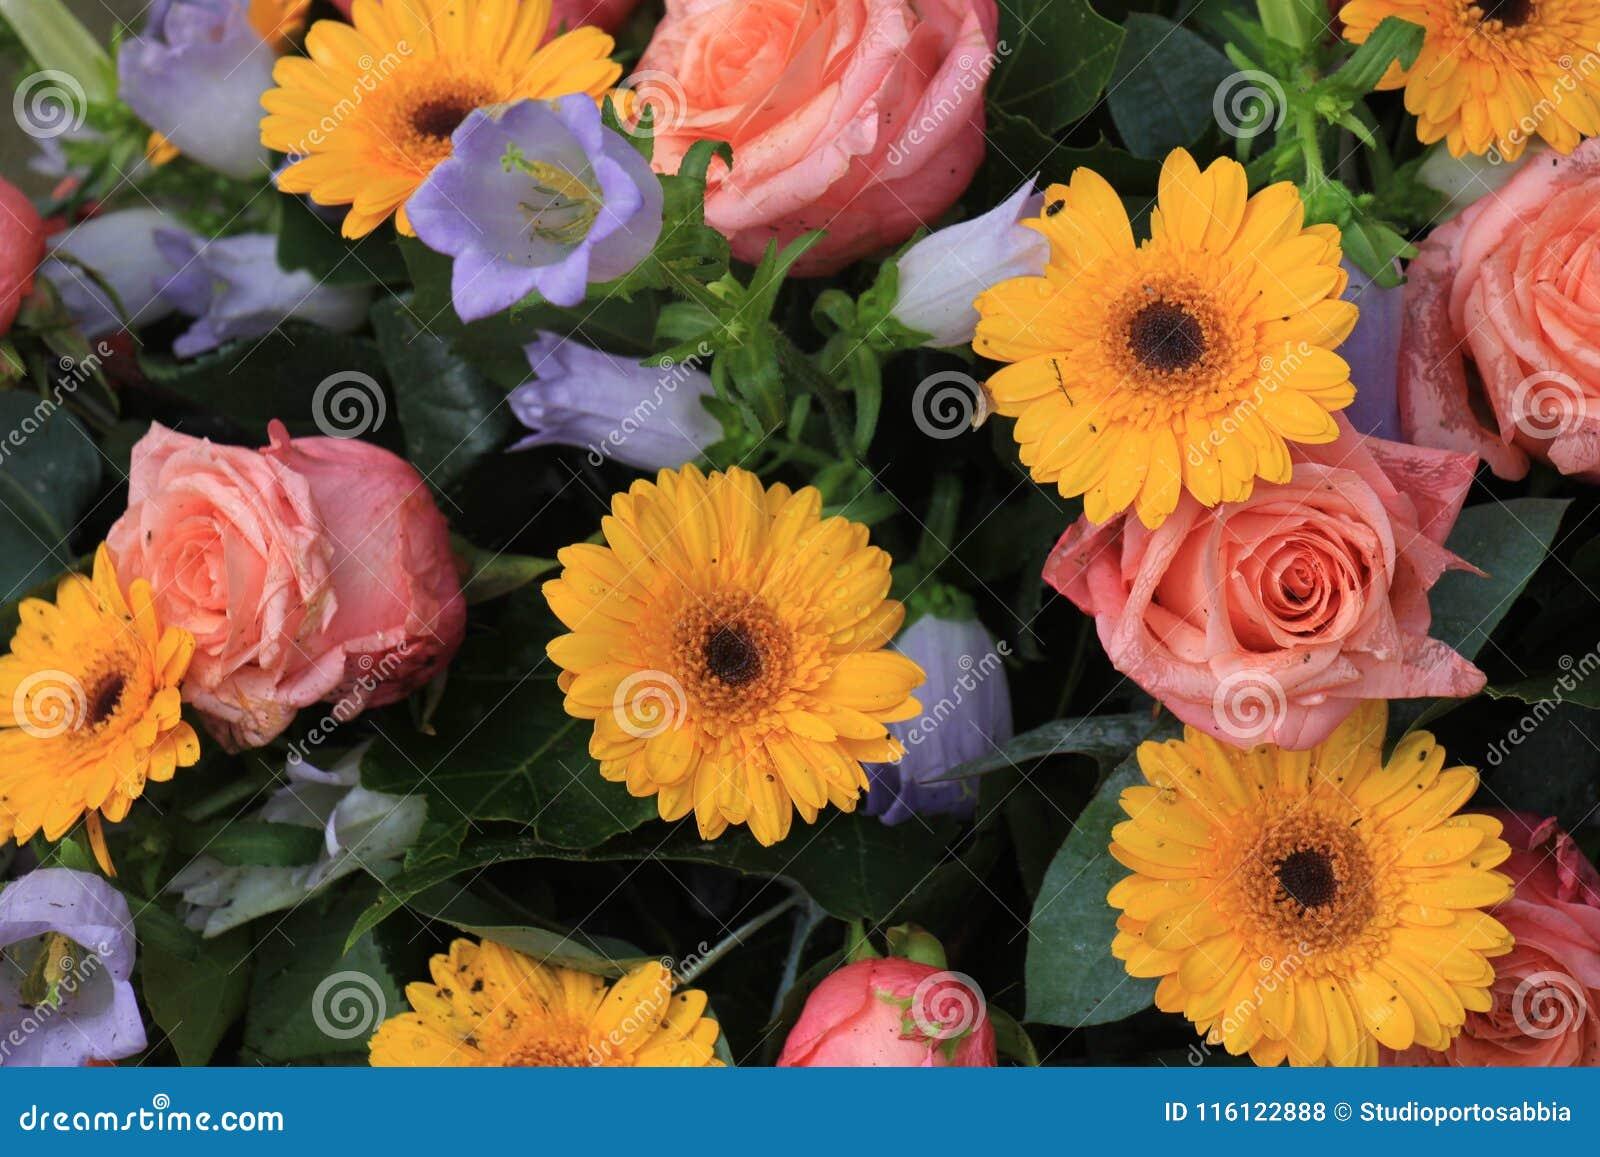 Orange And Pink Wedding Flowers Stock Photo Image Of Bouquet